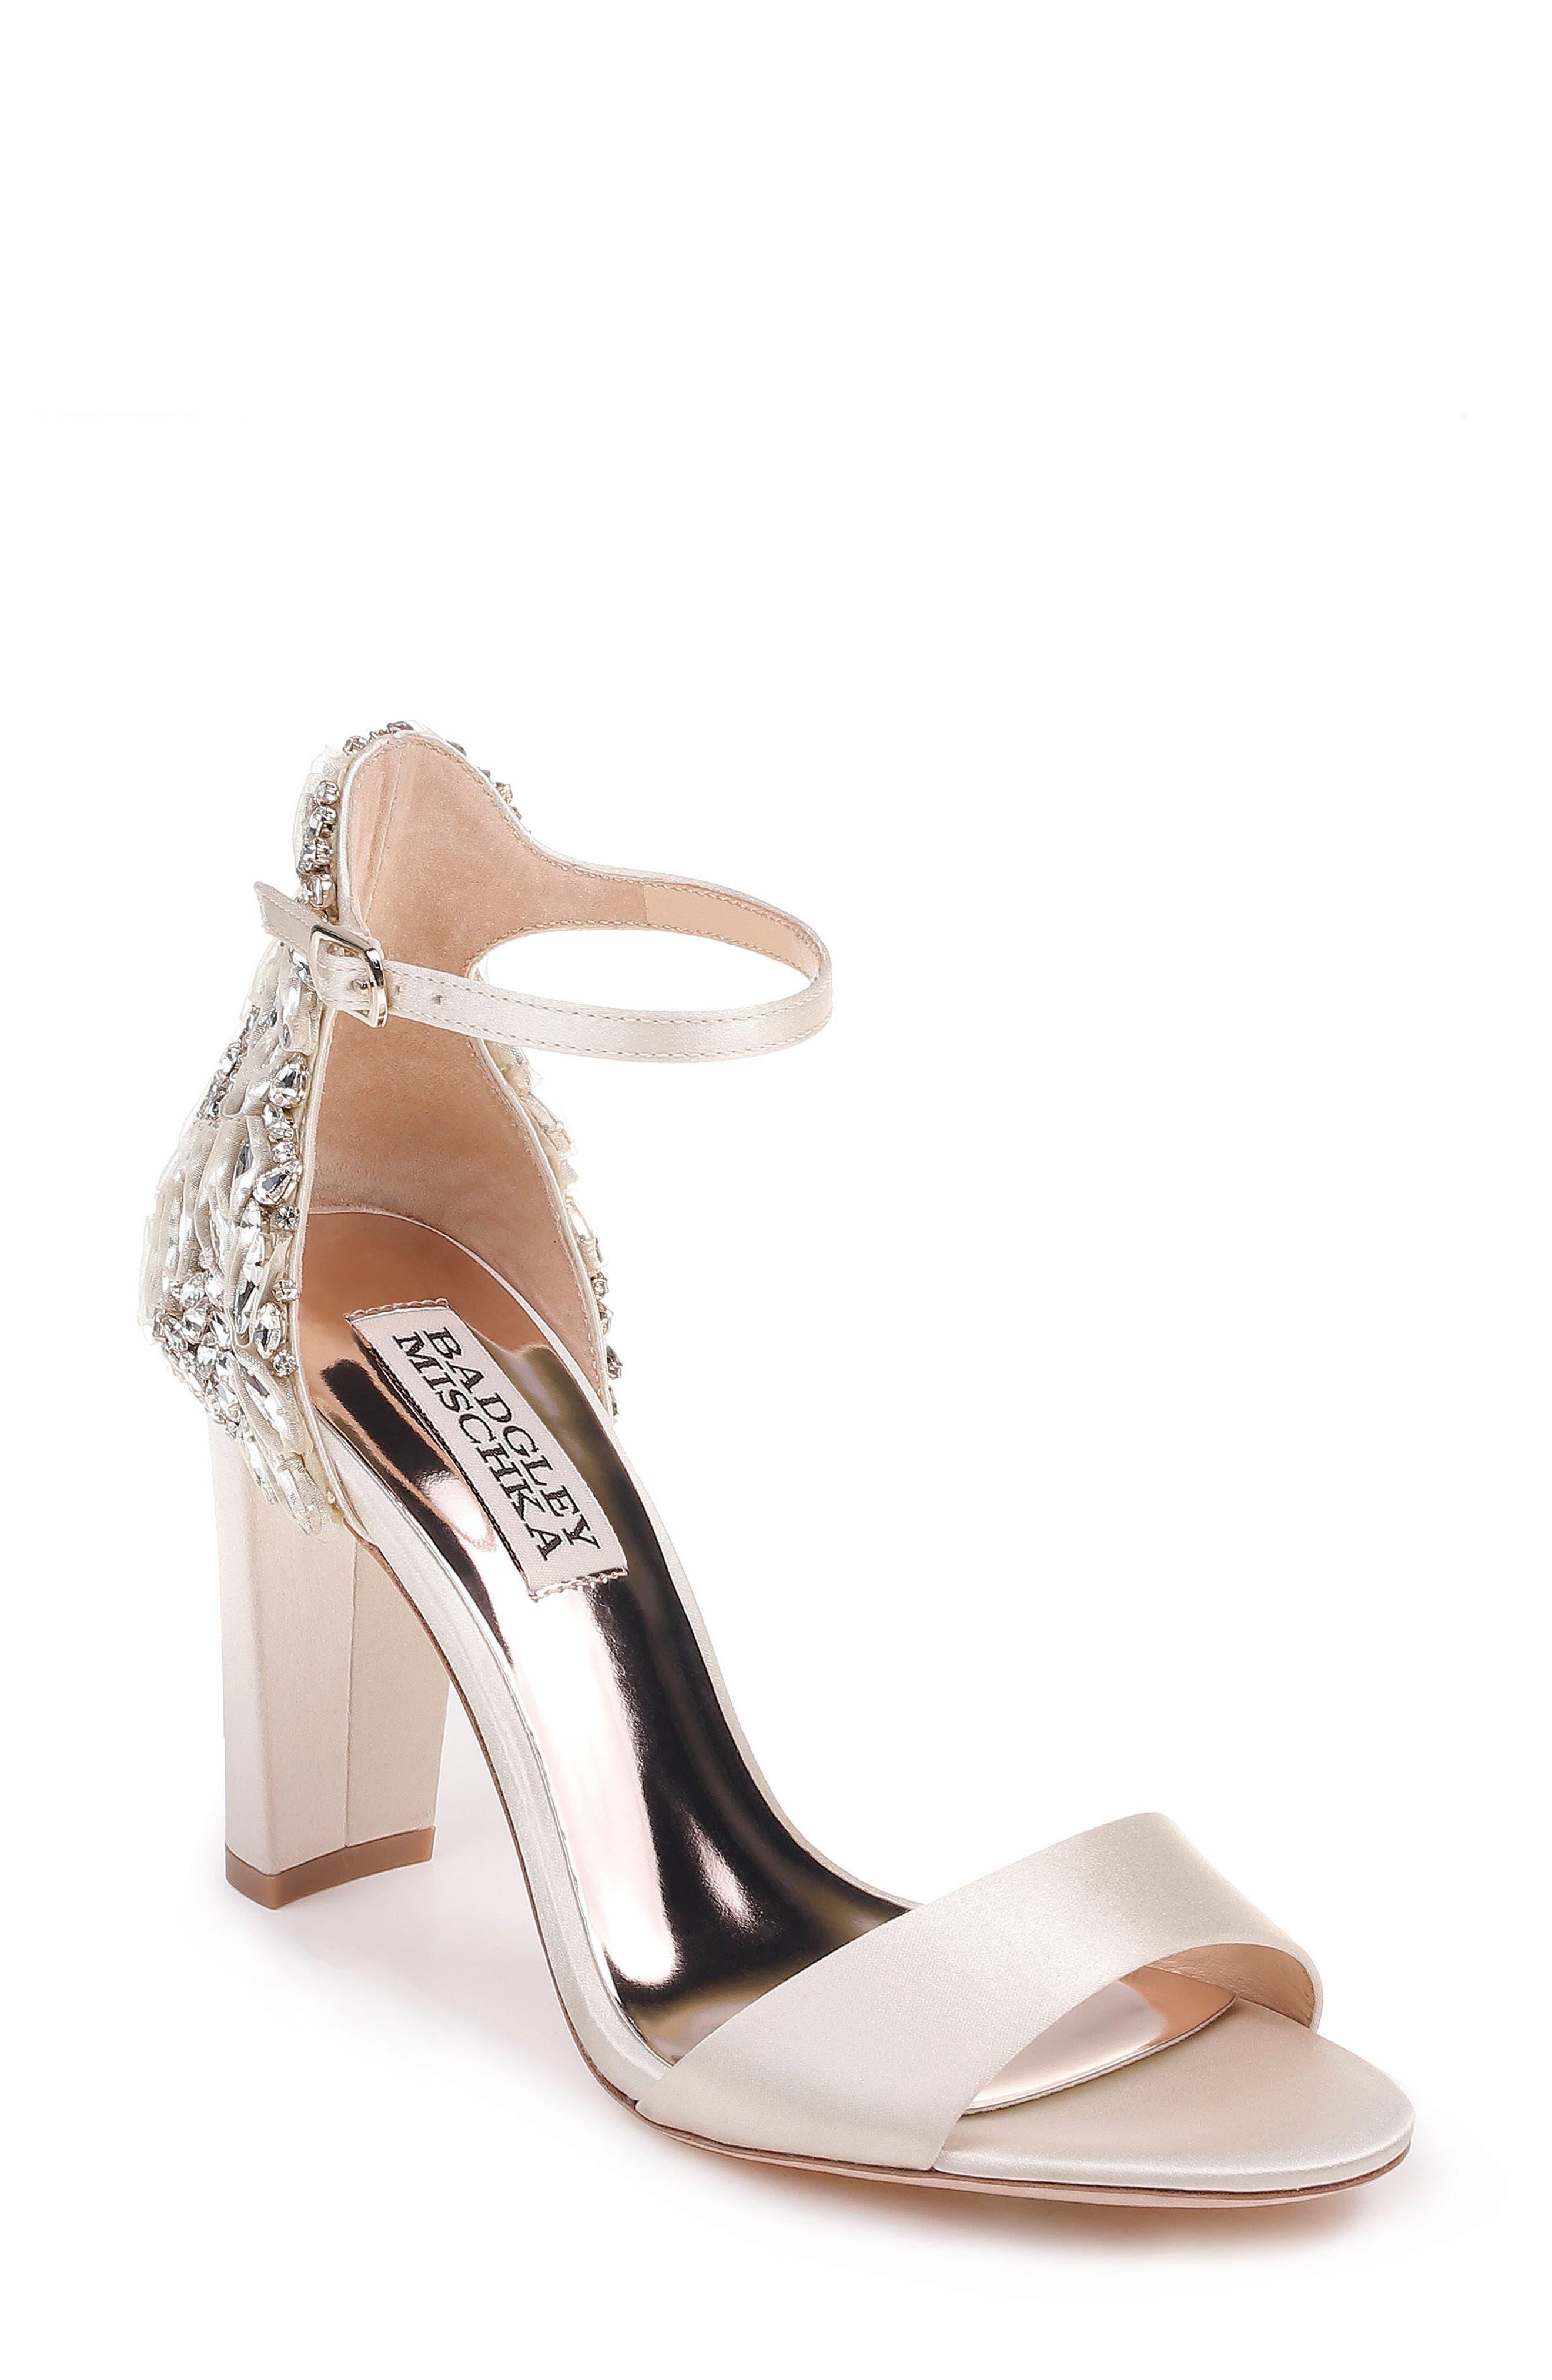 Alternate Image 1 Selected - Badgley Mischka Seina Ankle Strap Sandal (Women)